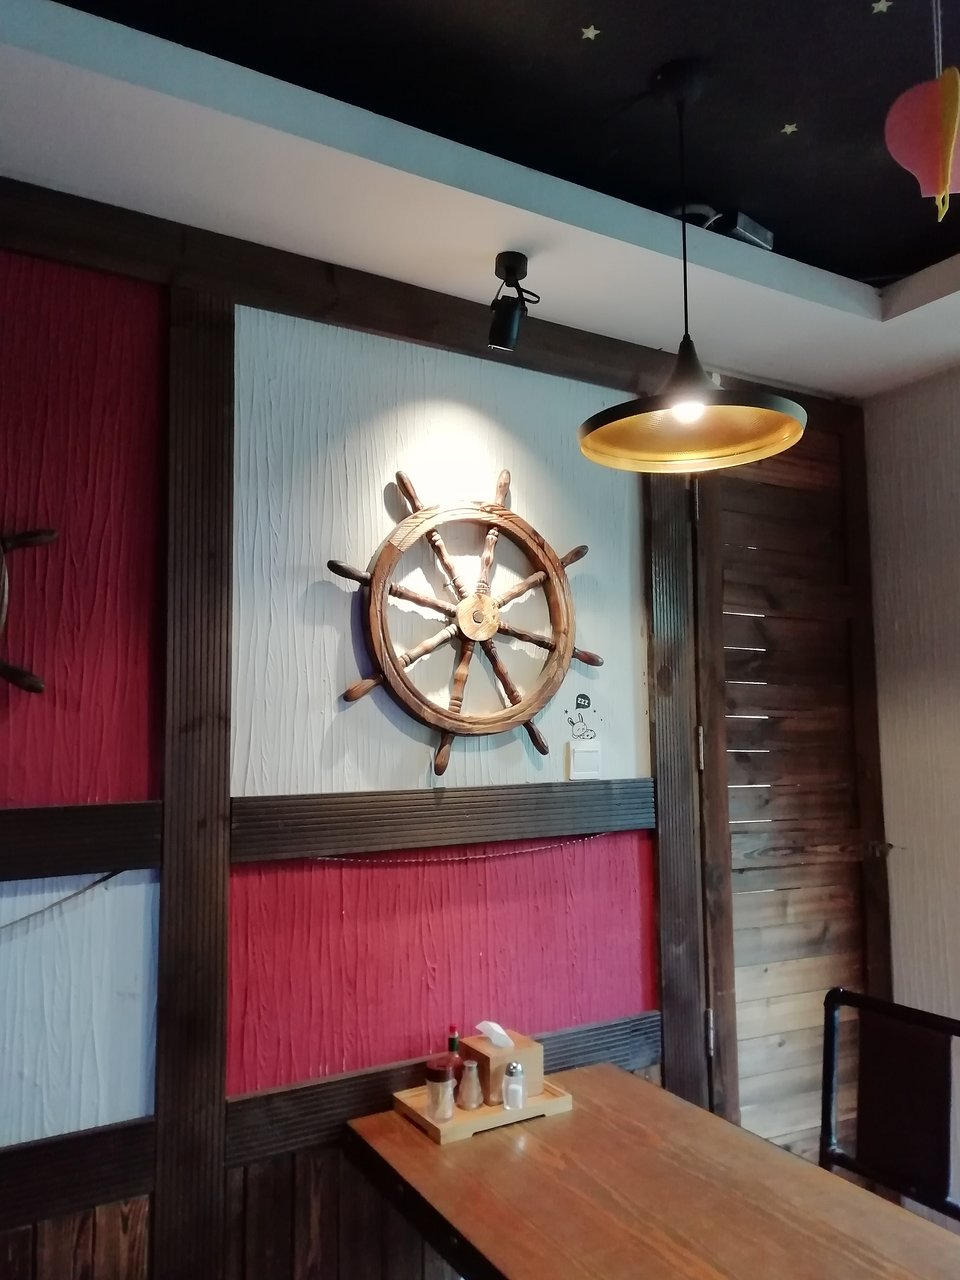 Achat Table Nouveau Rj Brown Hotel 3 Пекин отзывы фото и сравнение цен